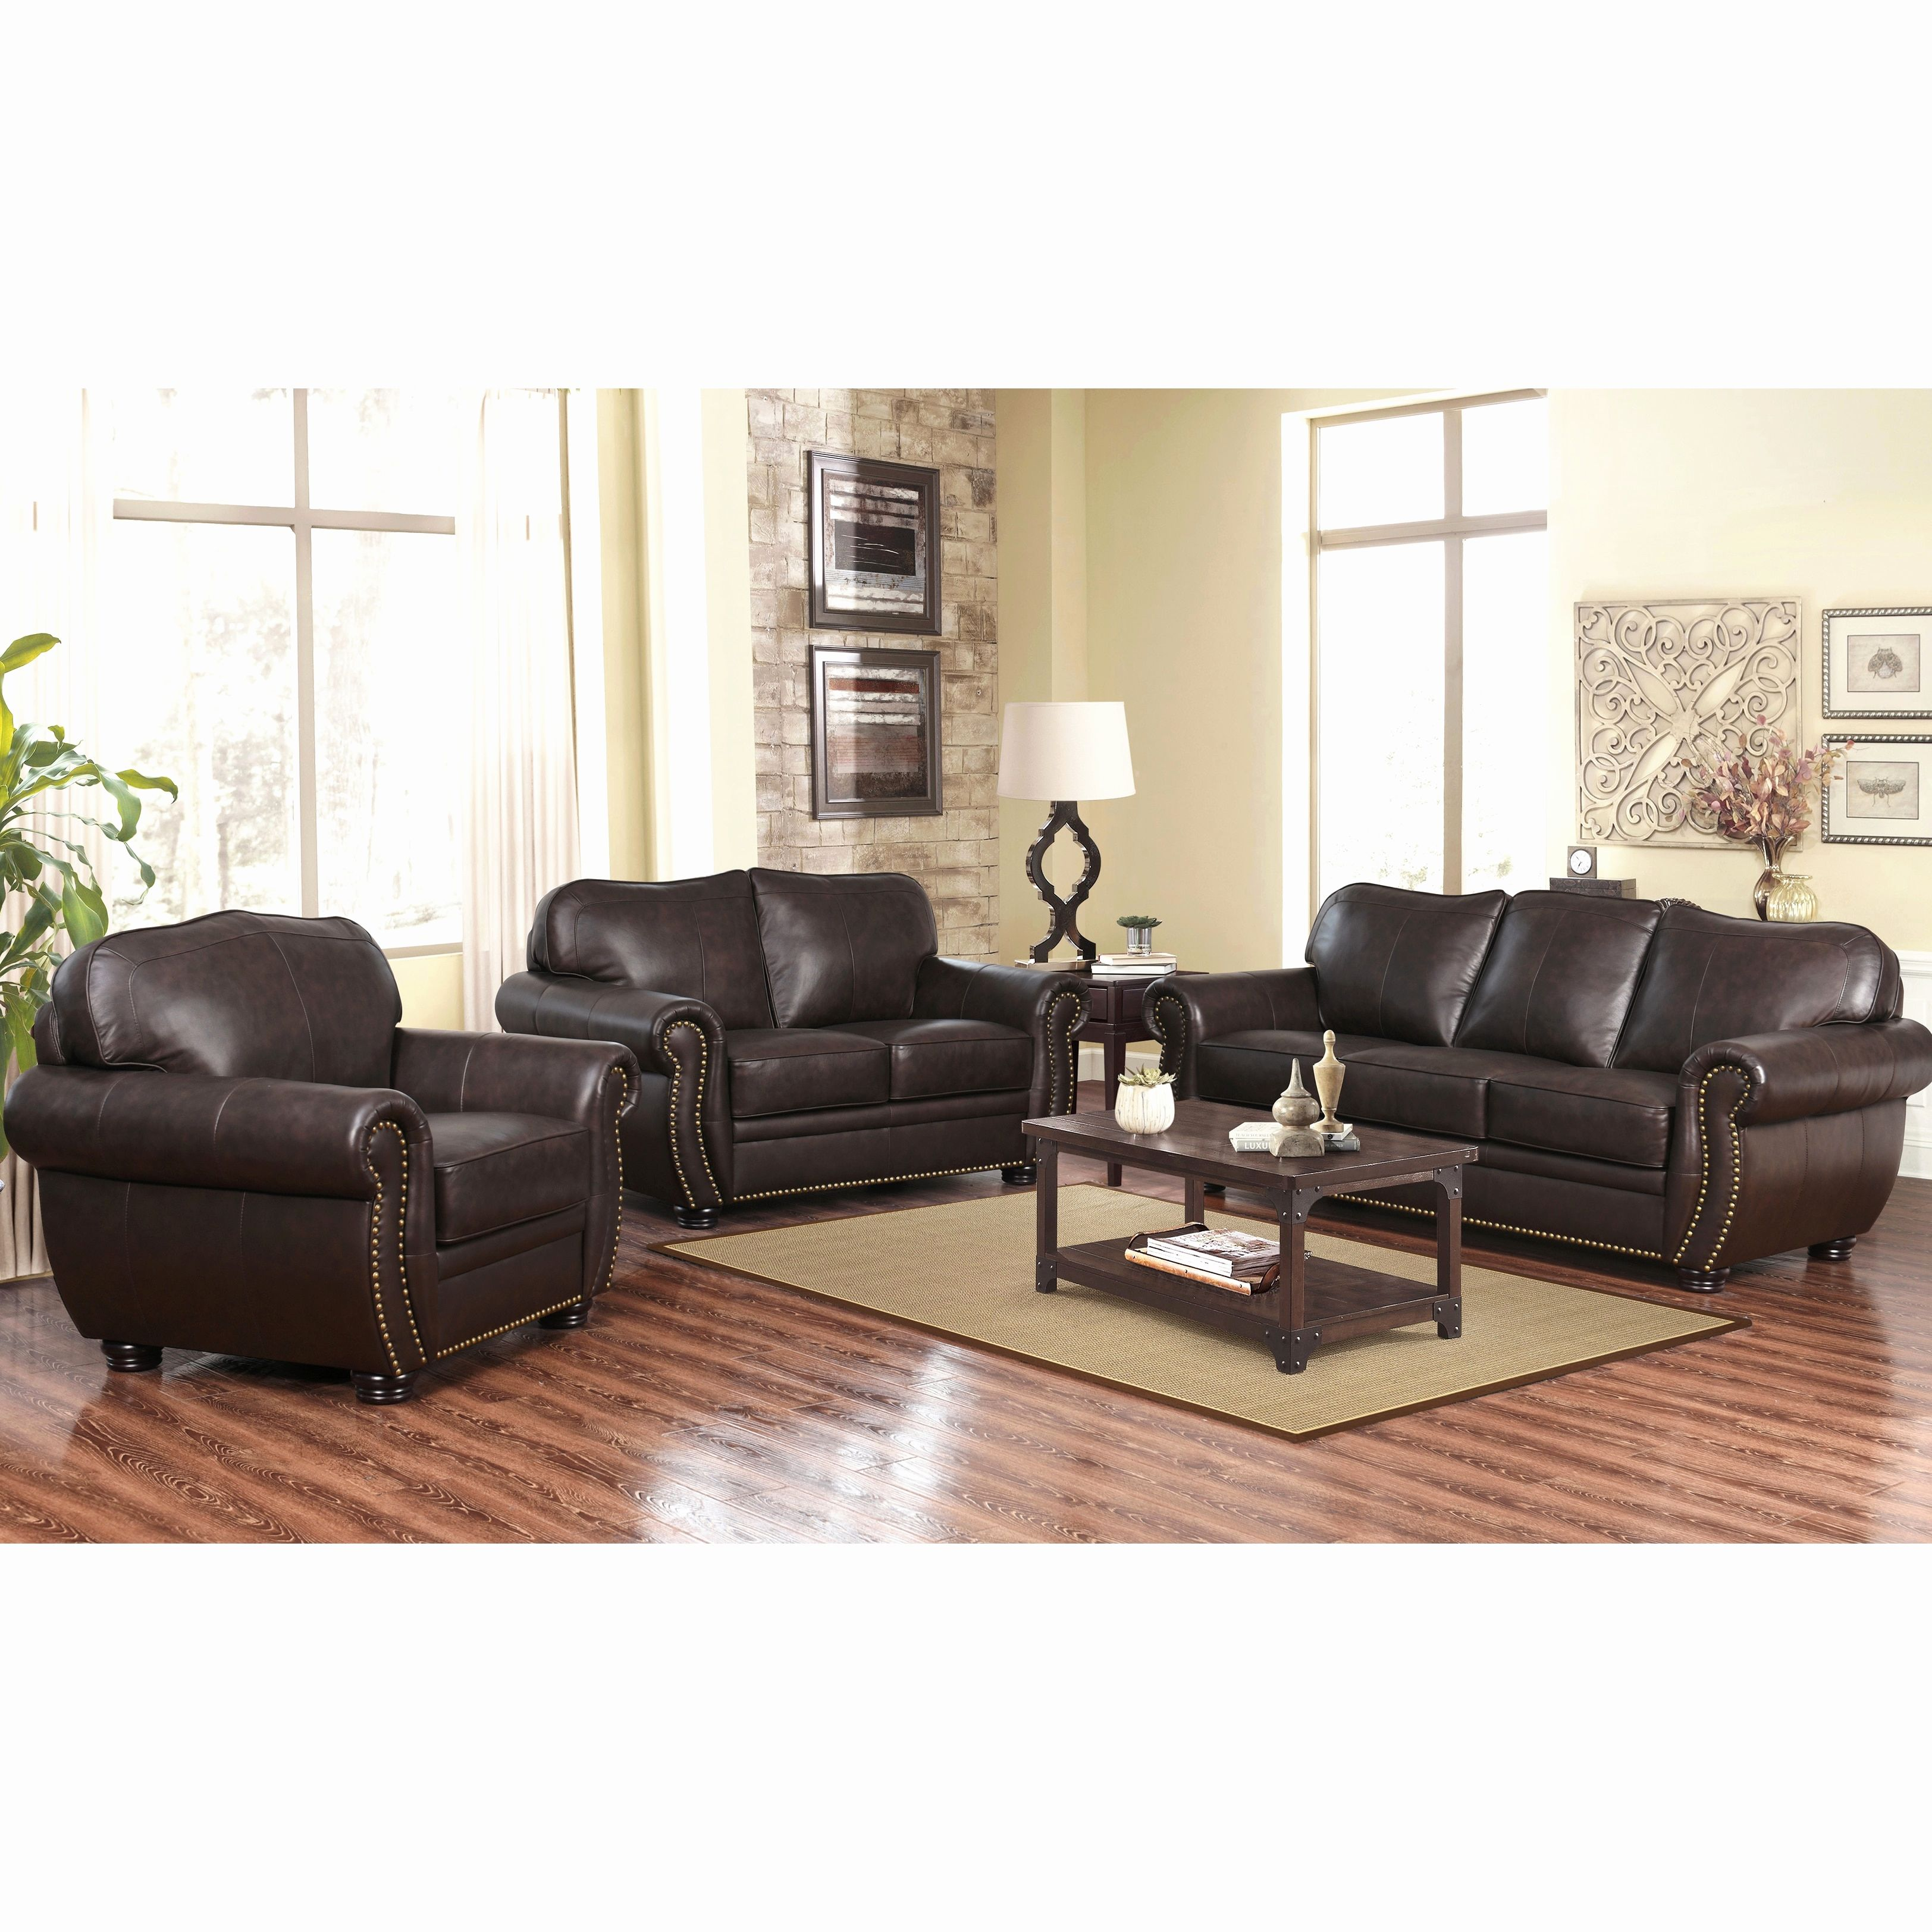 Lovely sofa set deals image sofa set deals beautiful sharp modern living room furniturees bedroome deals